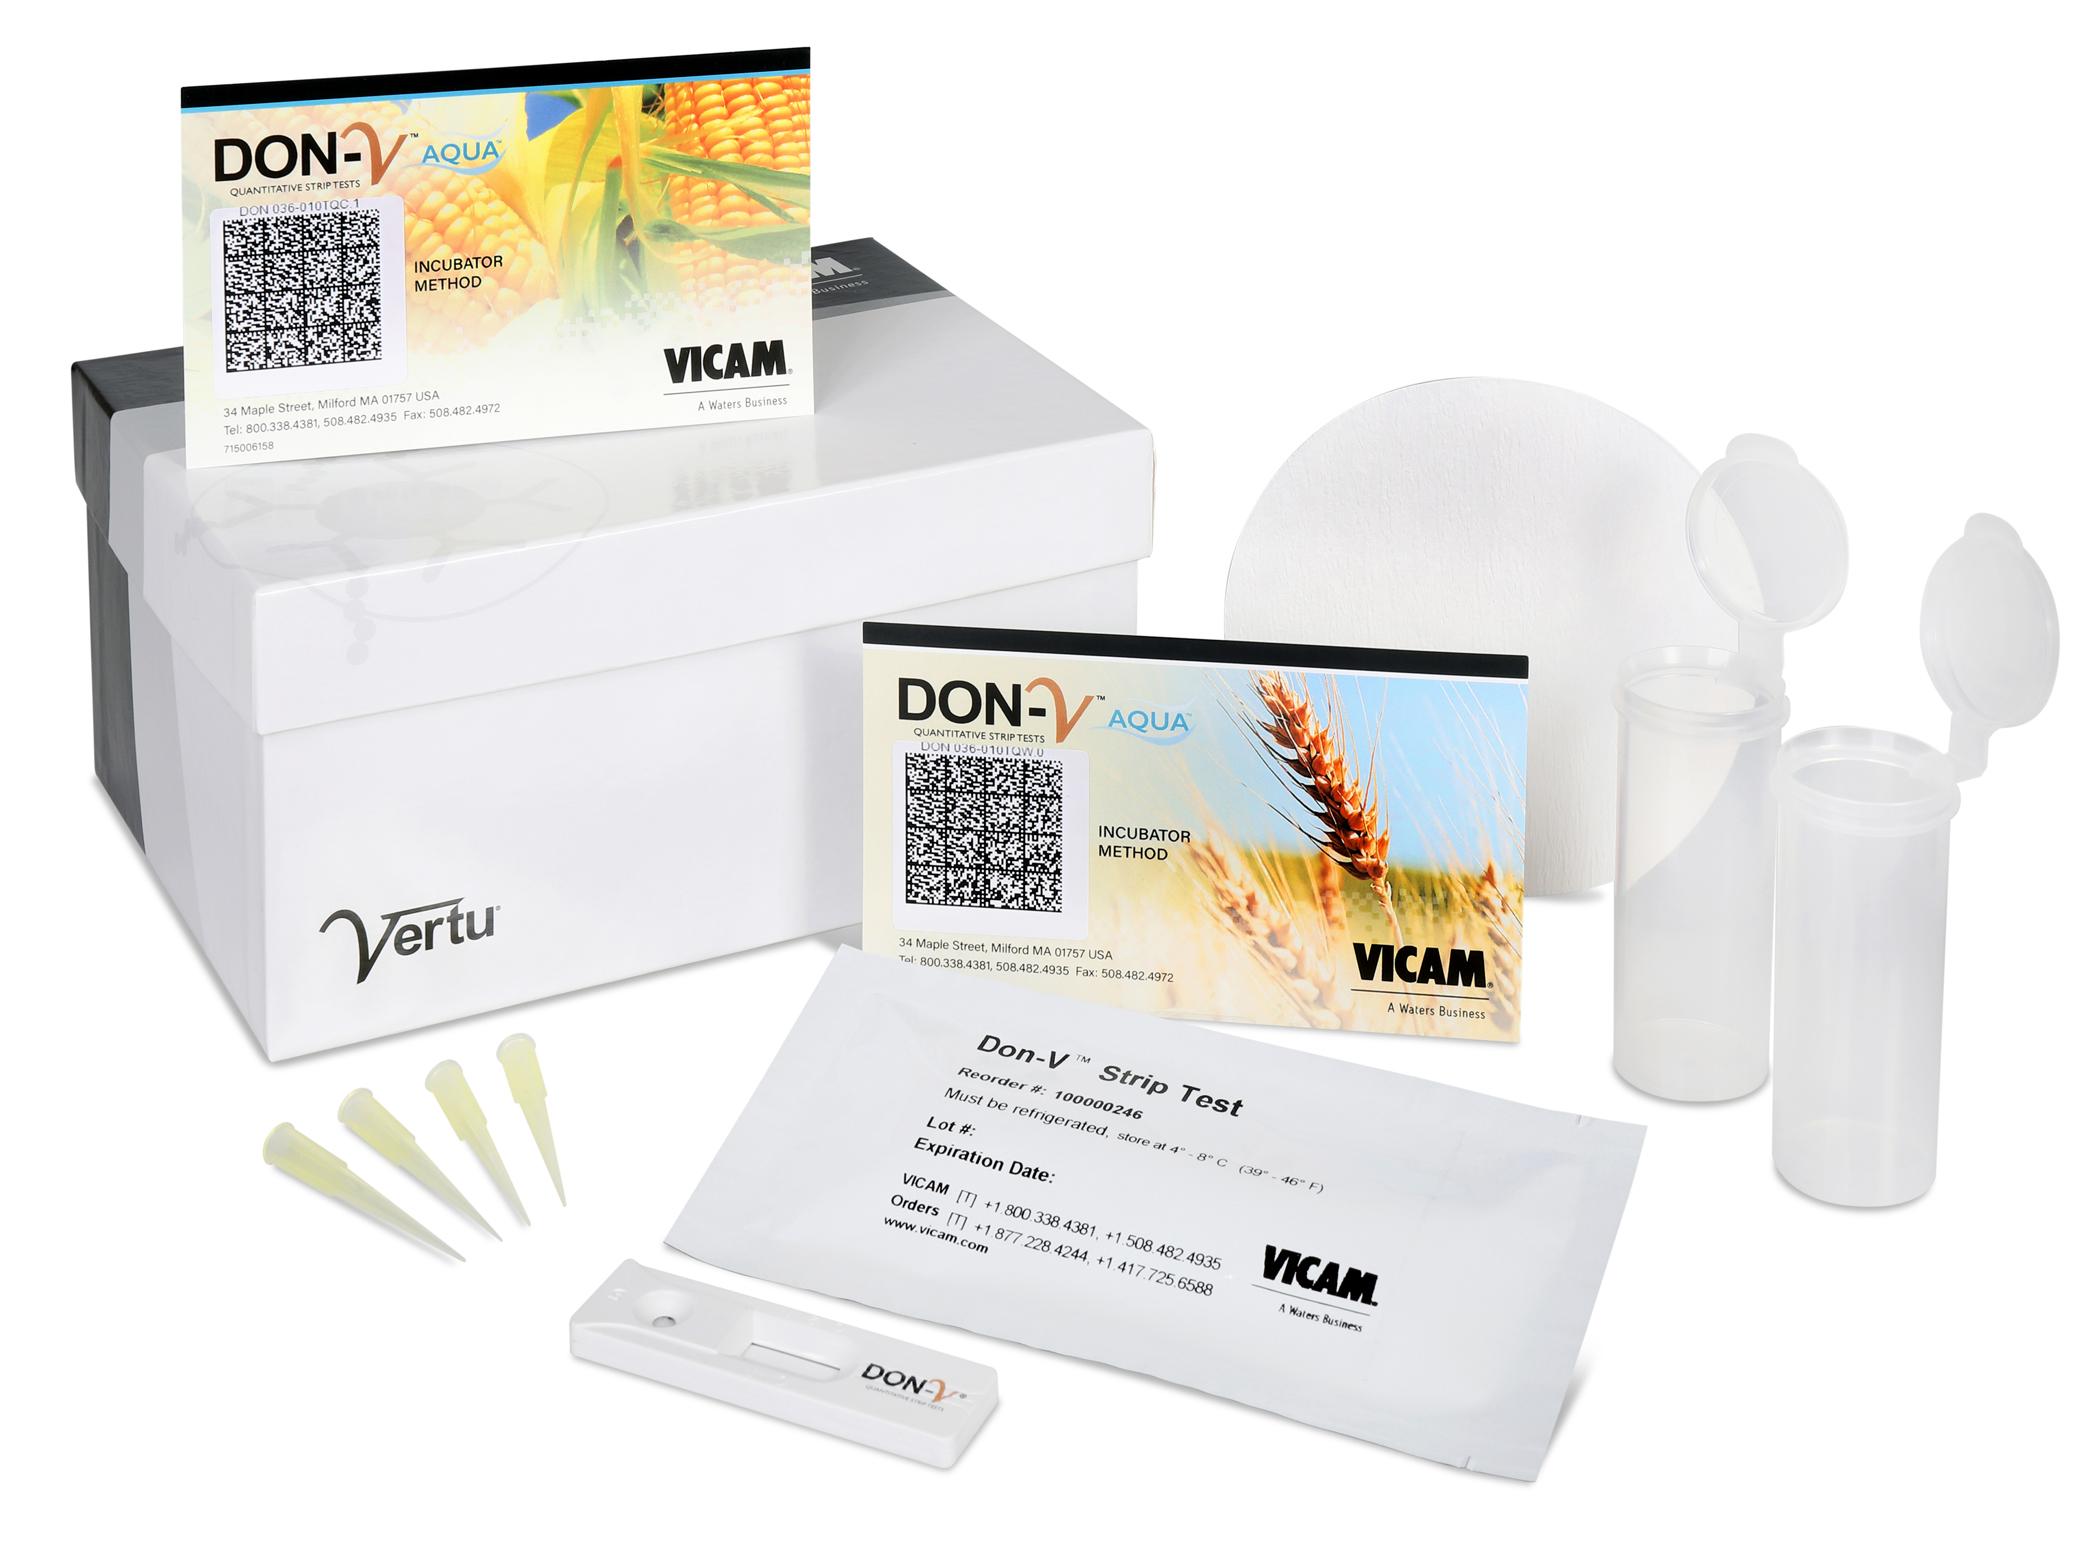 DON-V AQUA Kit (25 Tests)